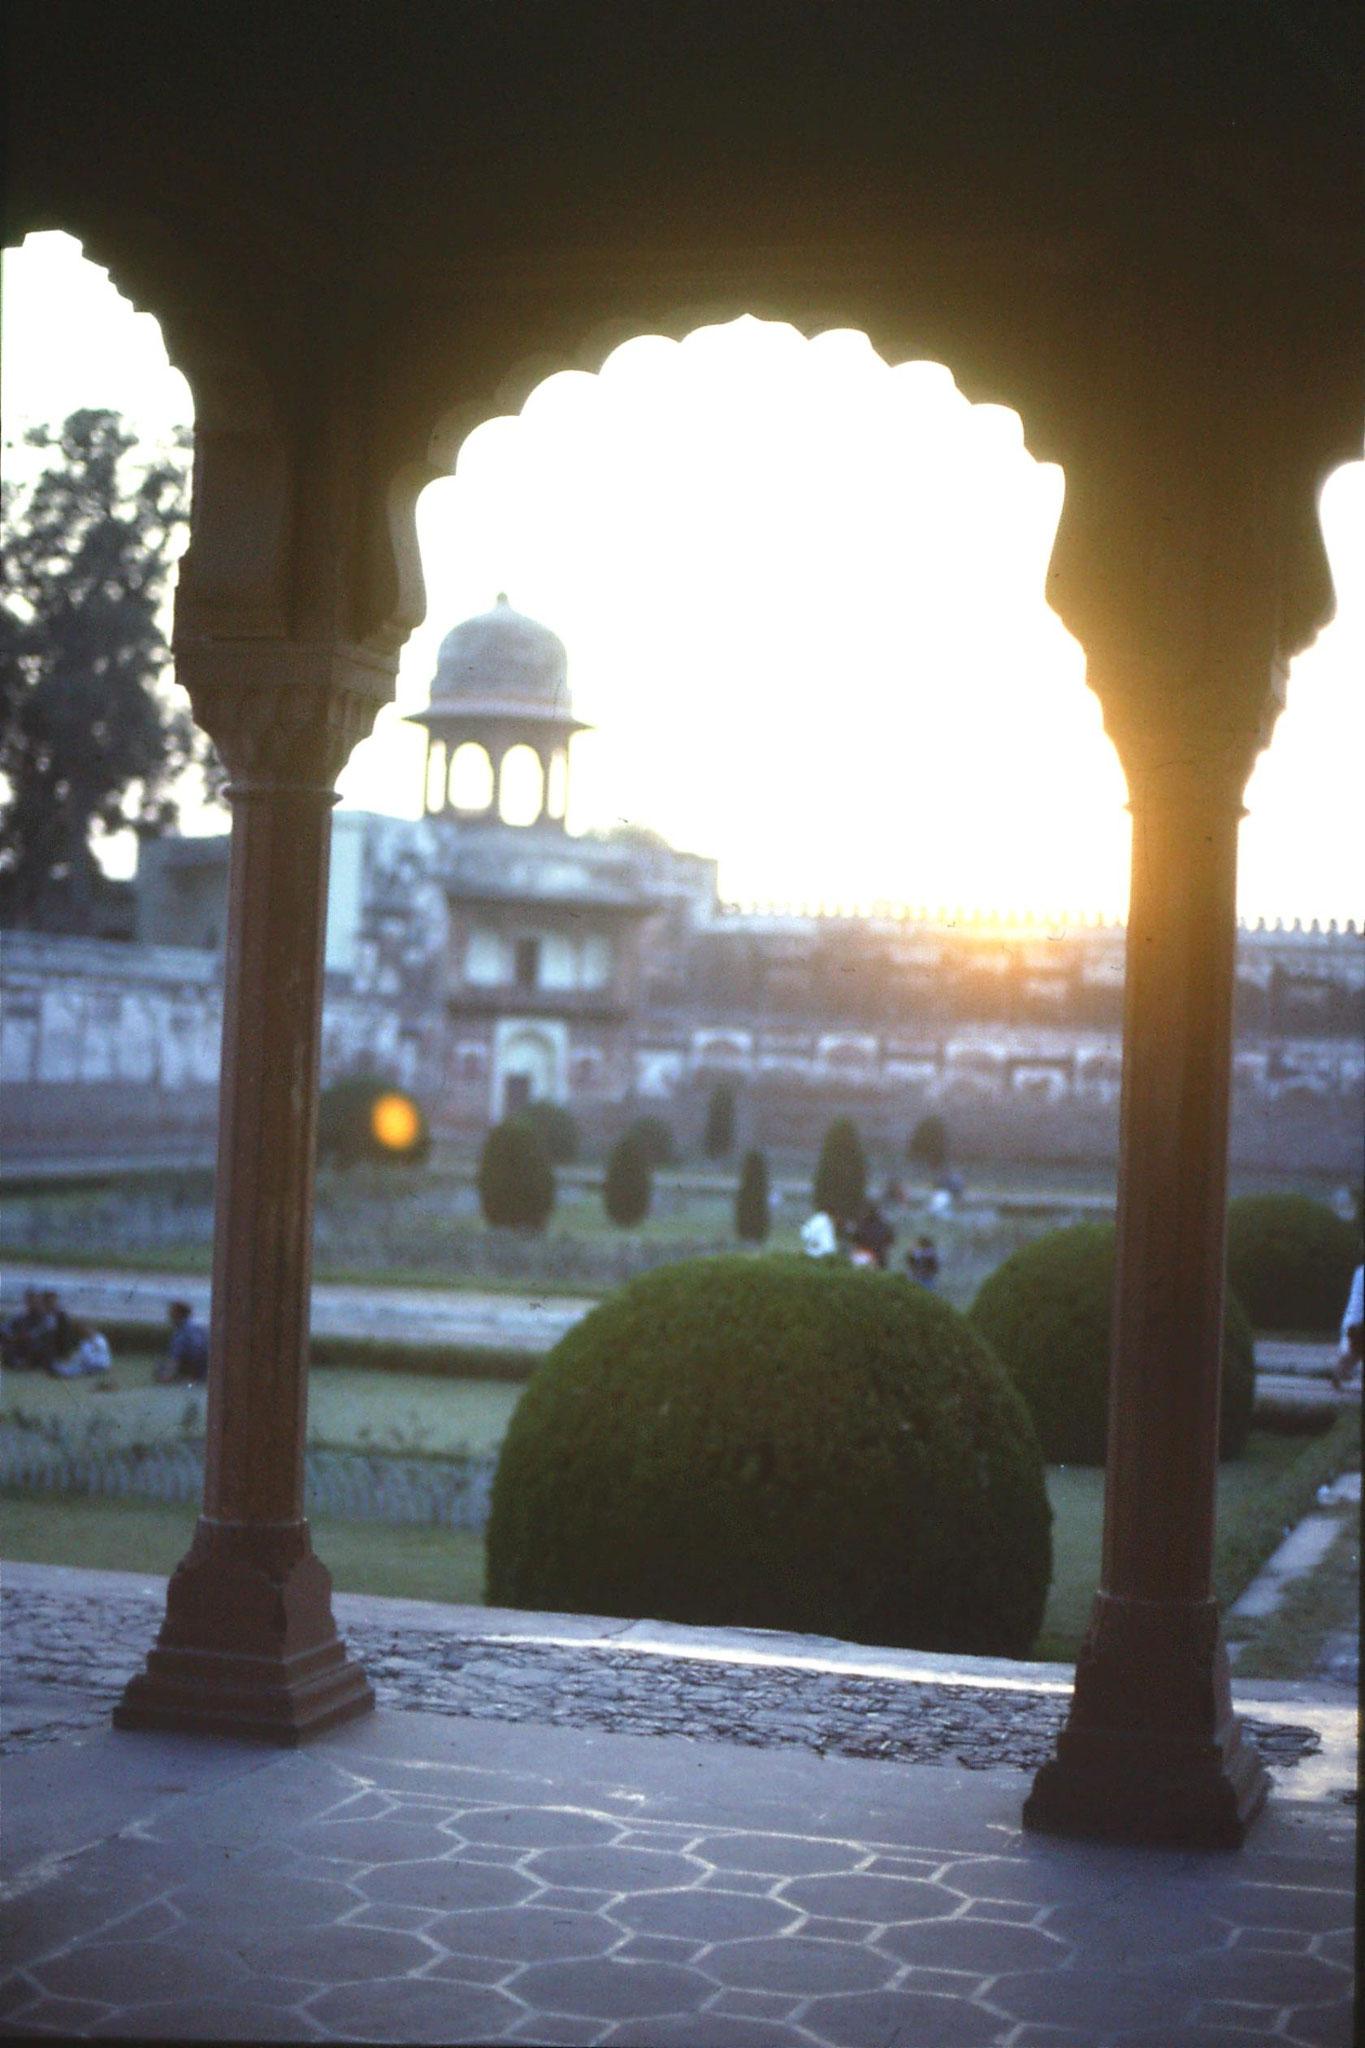 10/11/1989: 5: Lahore, Shalimar gardens